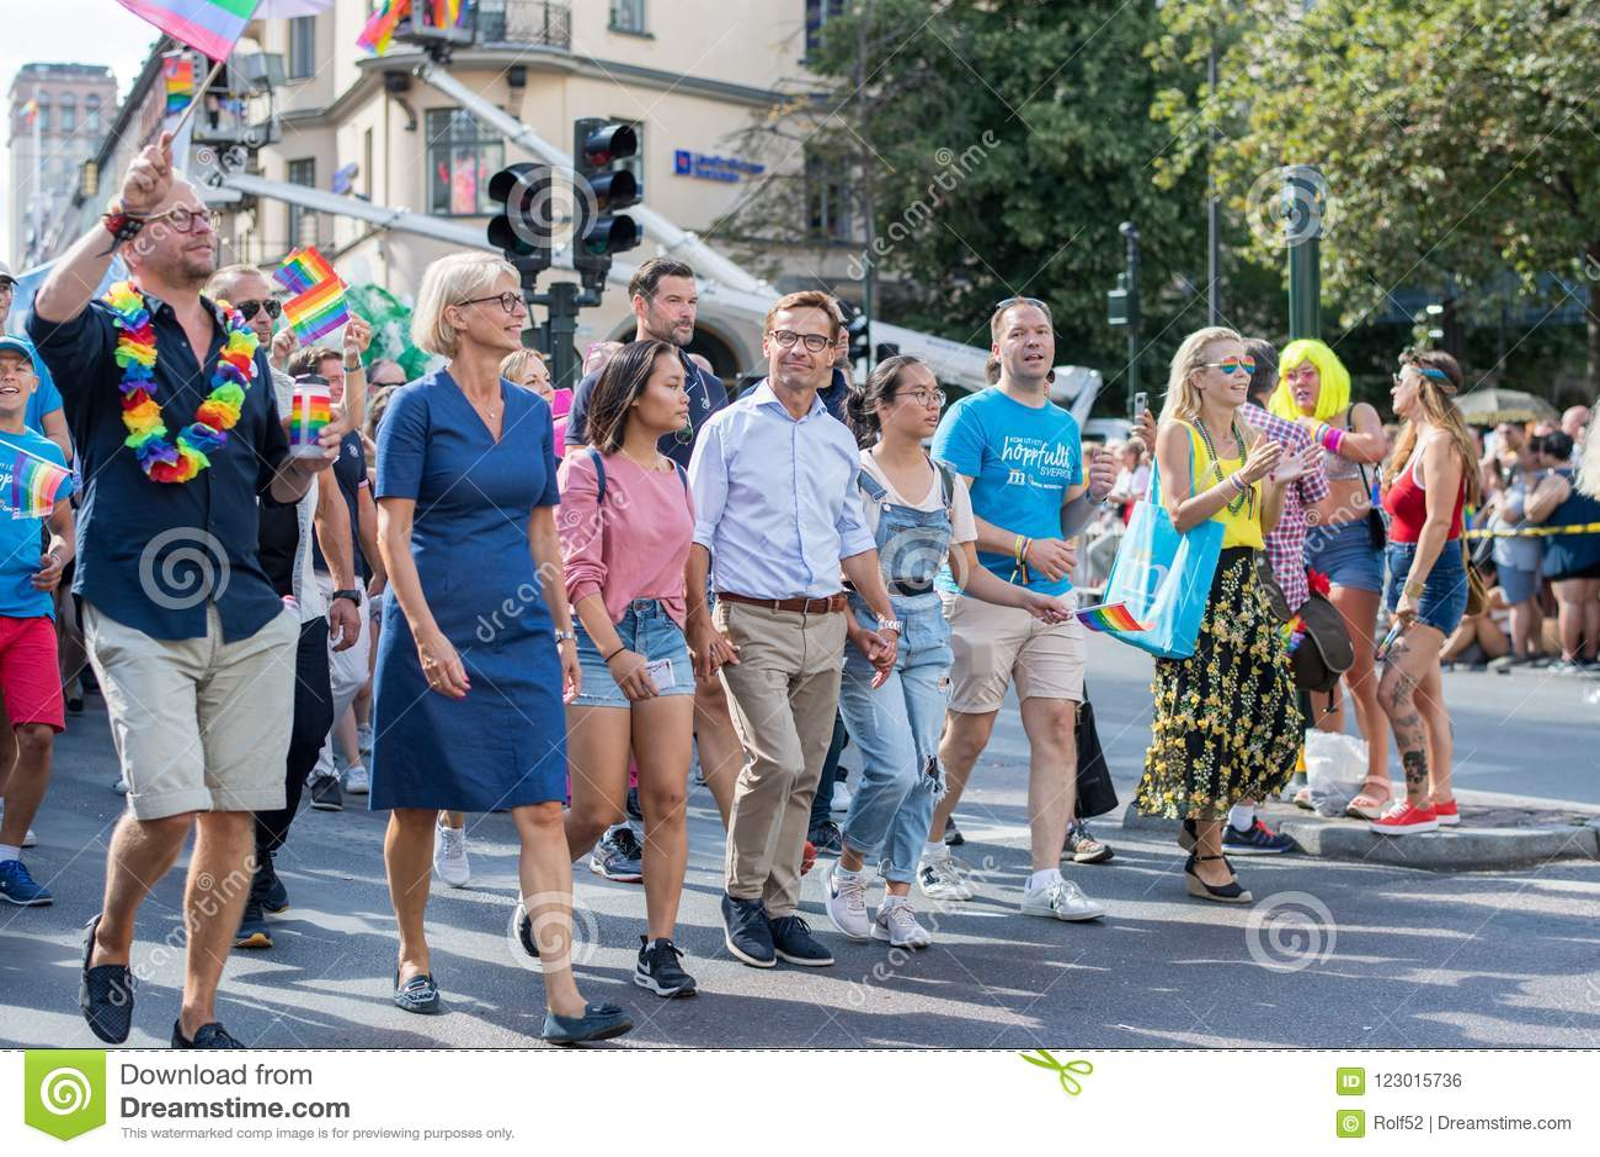 EuroPride 2018 with Stockholm Pride Parade